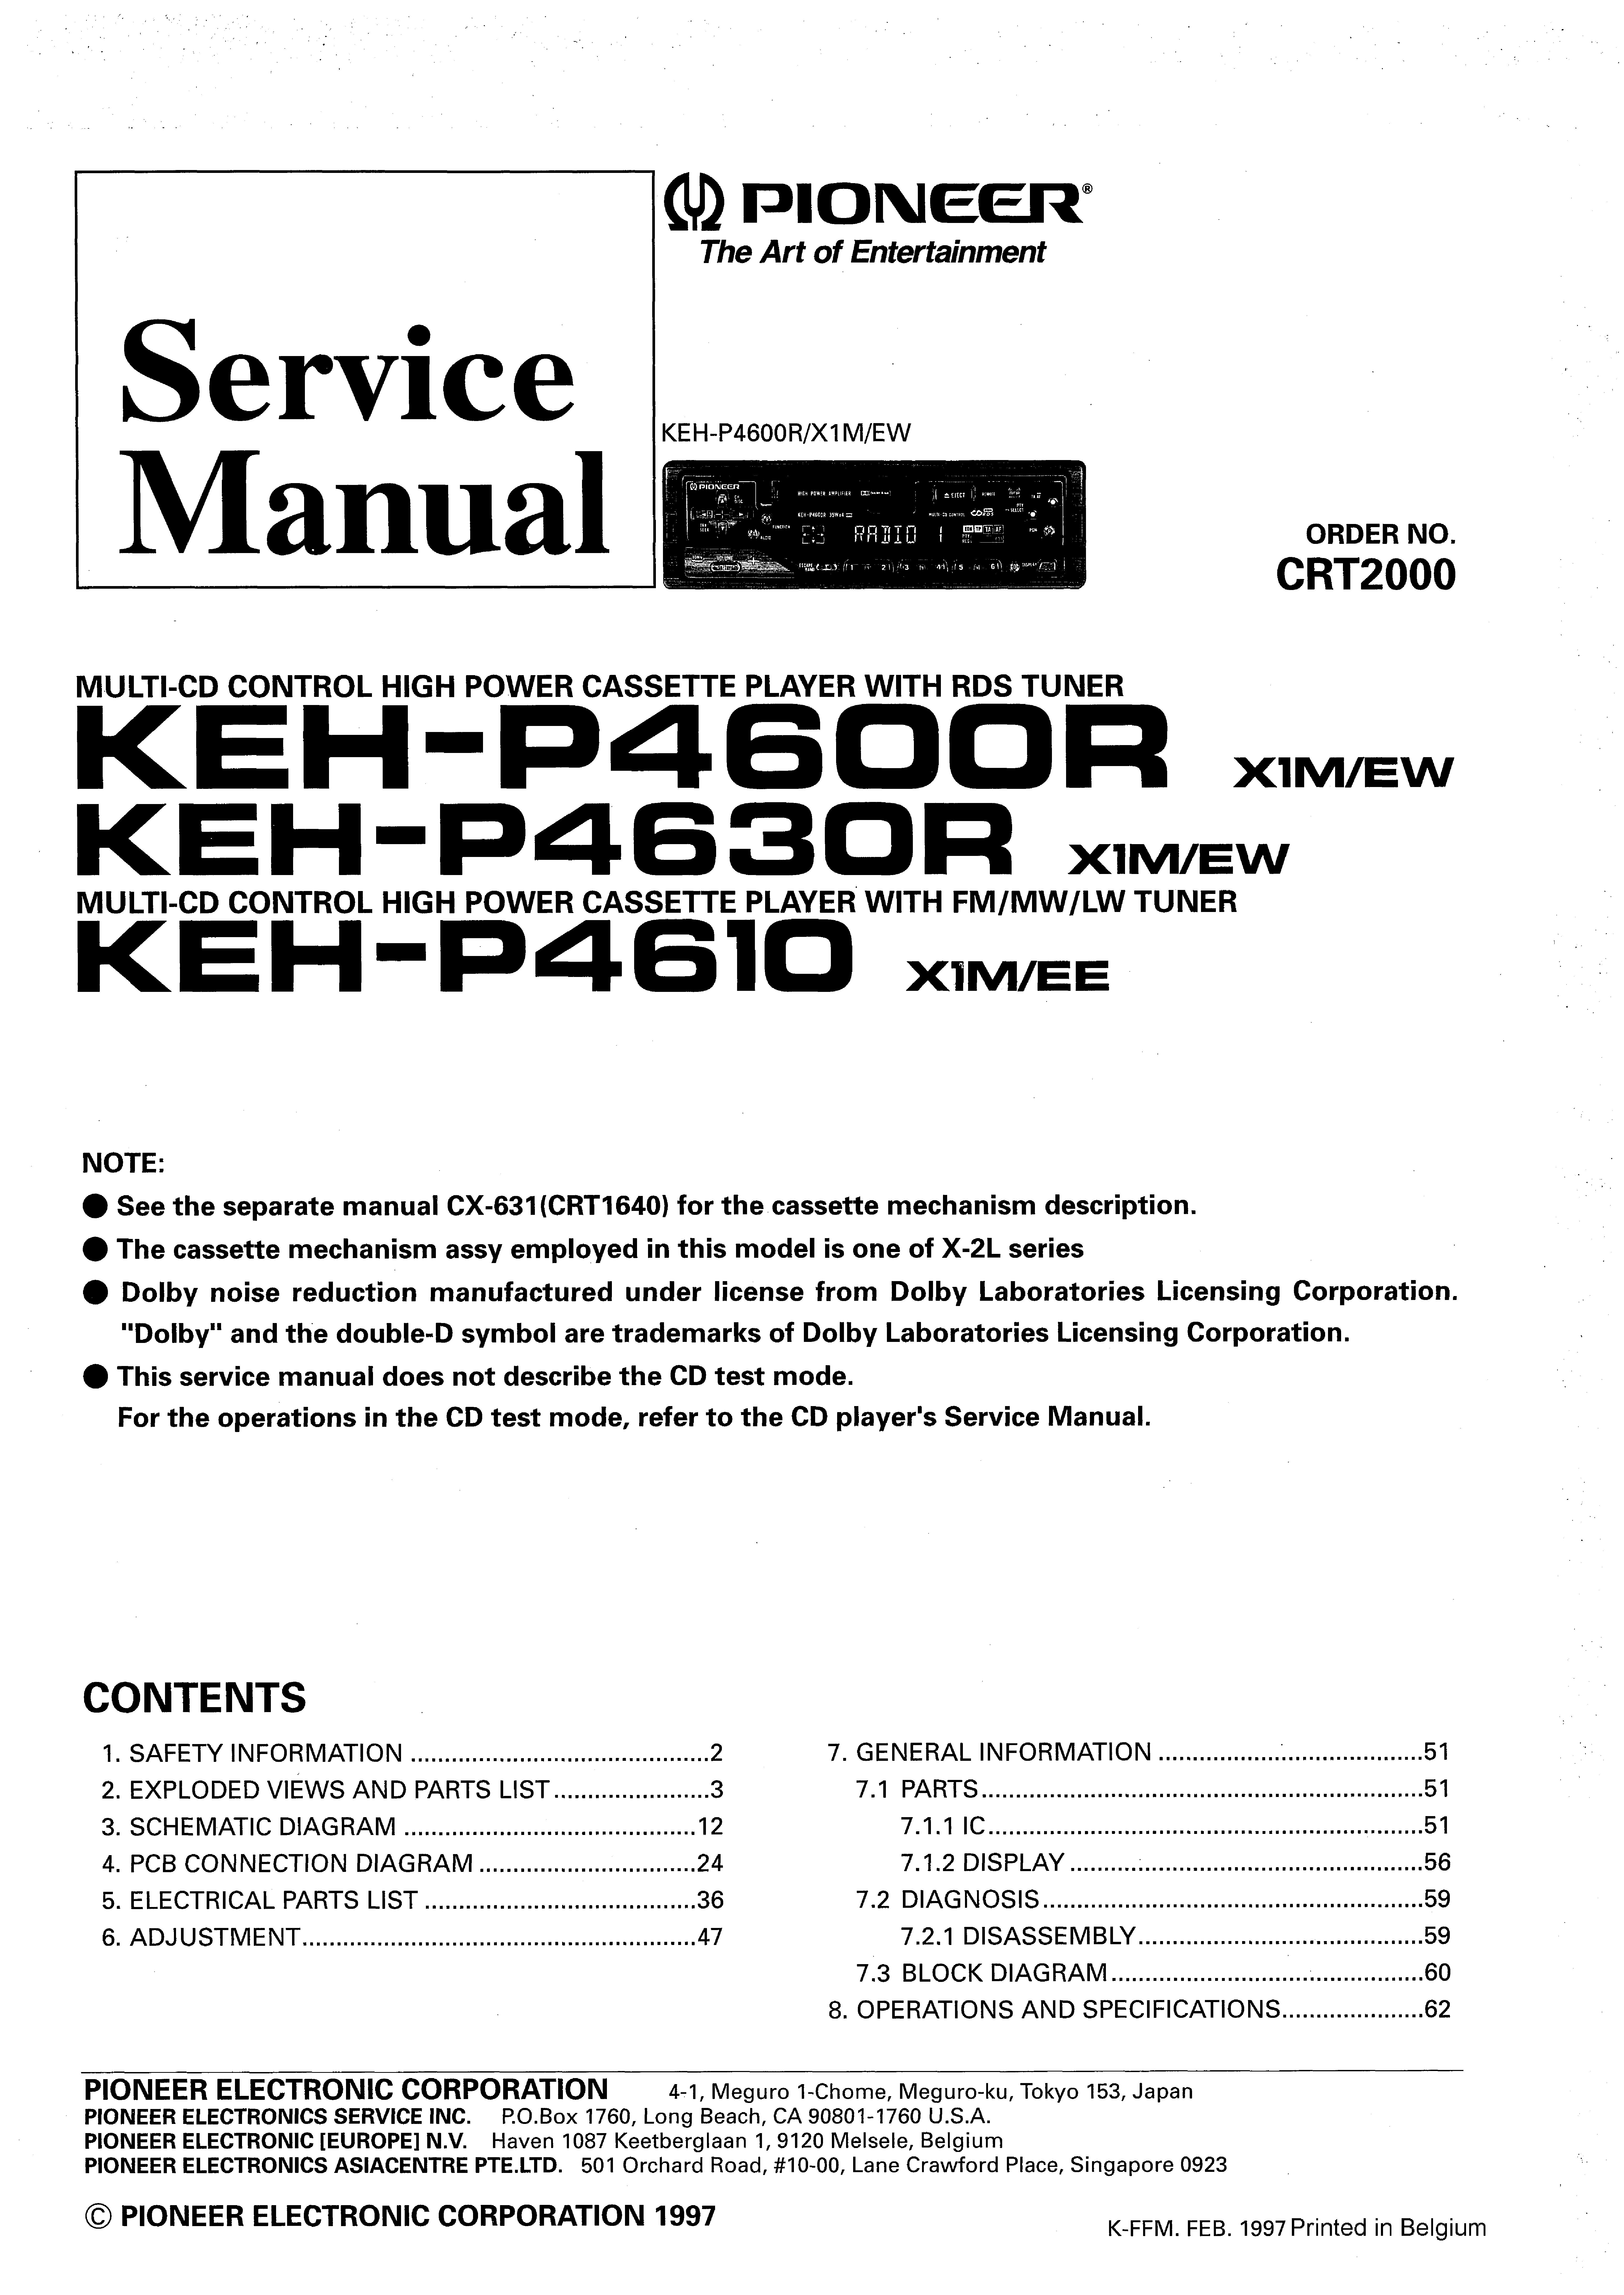 pioneer keh p4600r user manual. Black Bedroom Furniture Sets. Home Design Ideas